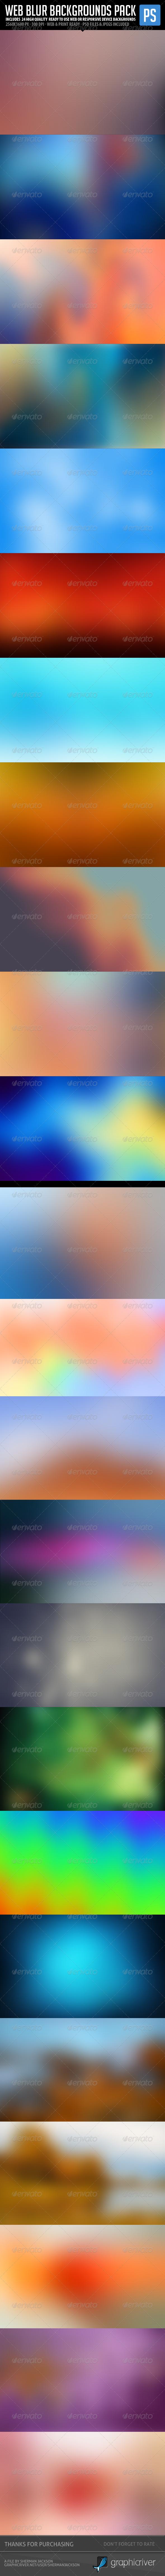 Web Blur Backgrounds Bundle Pack - Backgrounds Graphics